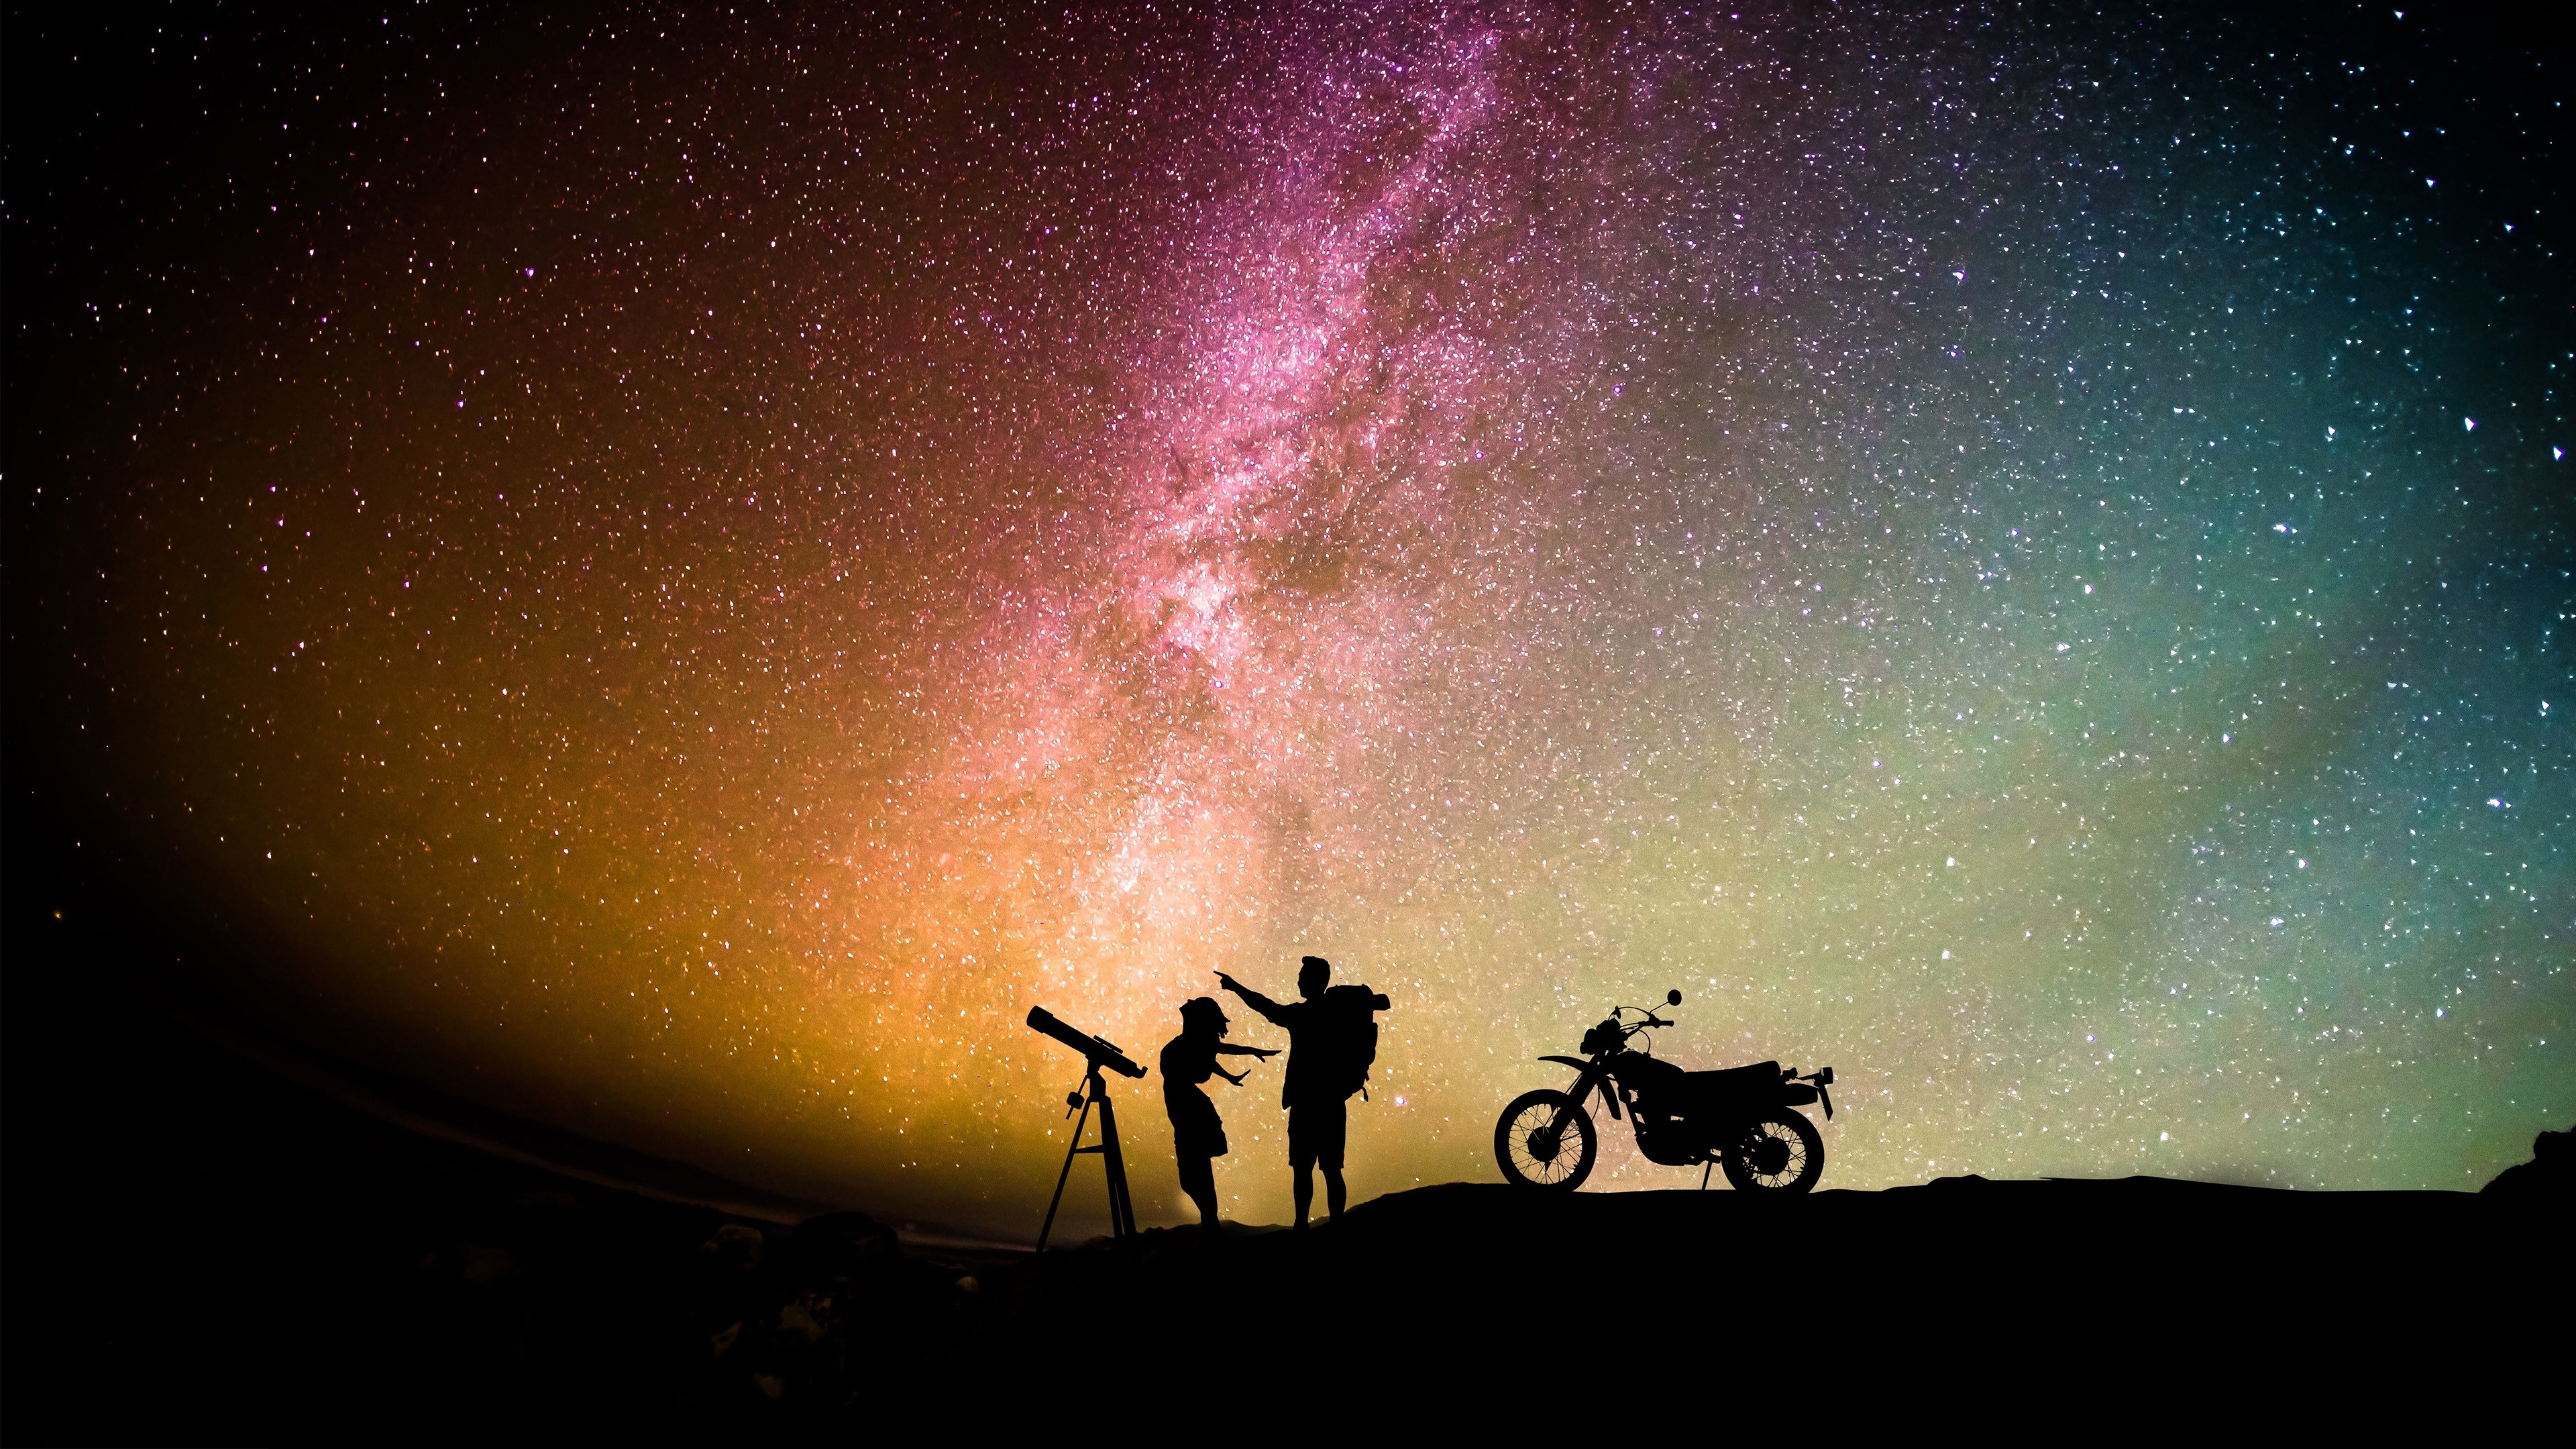 Wallpaper Night Starry Stars Sky Lovers Motorcycle Romantic